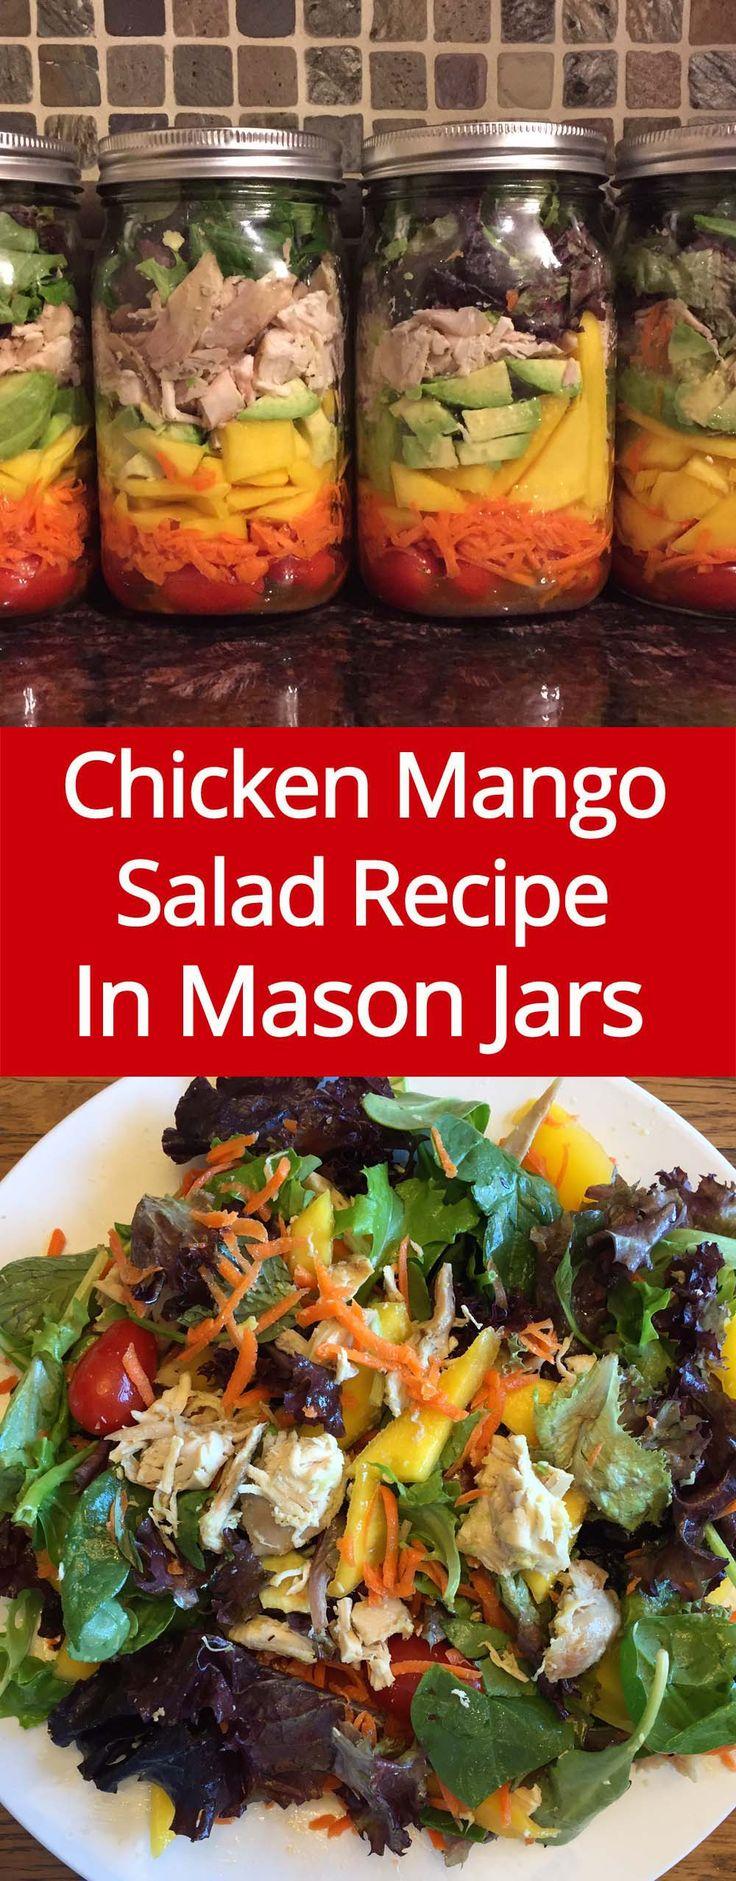 ... mason jar salad deal on Pinterest   Mason jar salads, Instant ramen